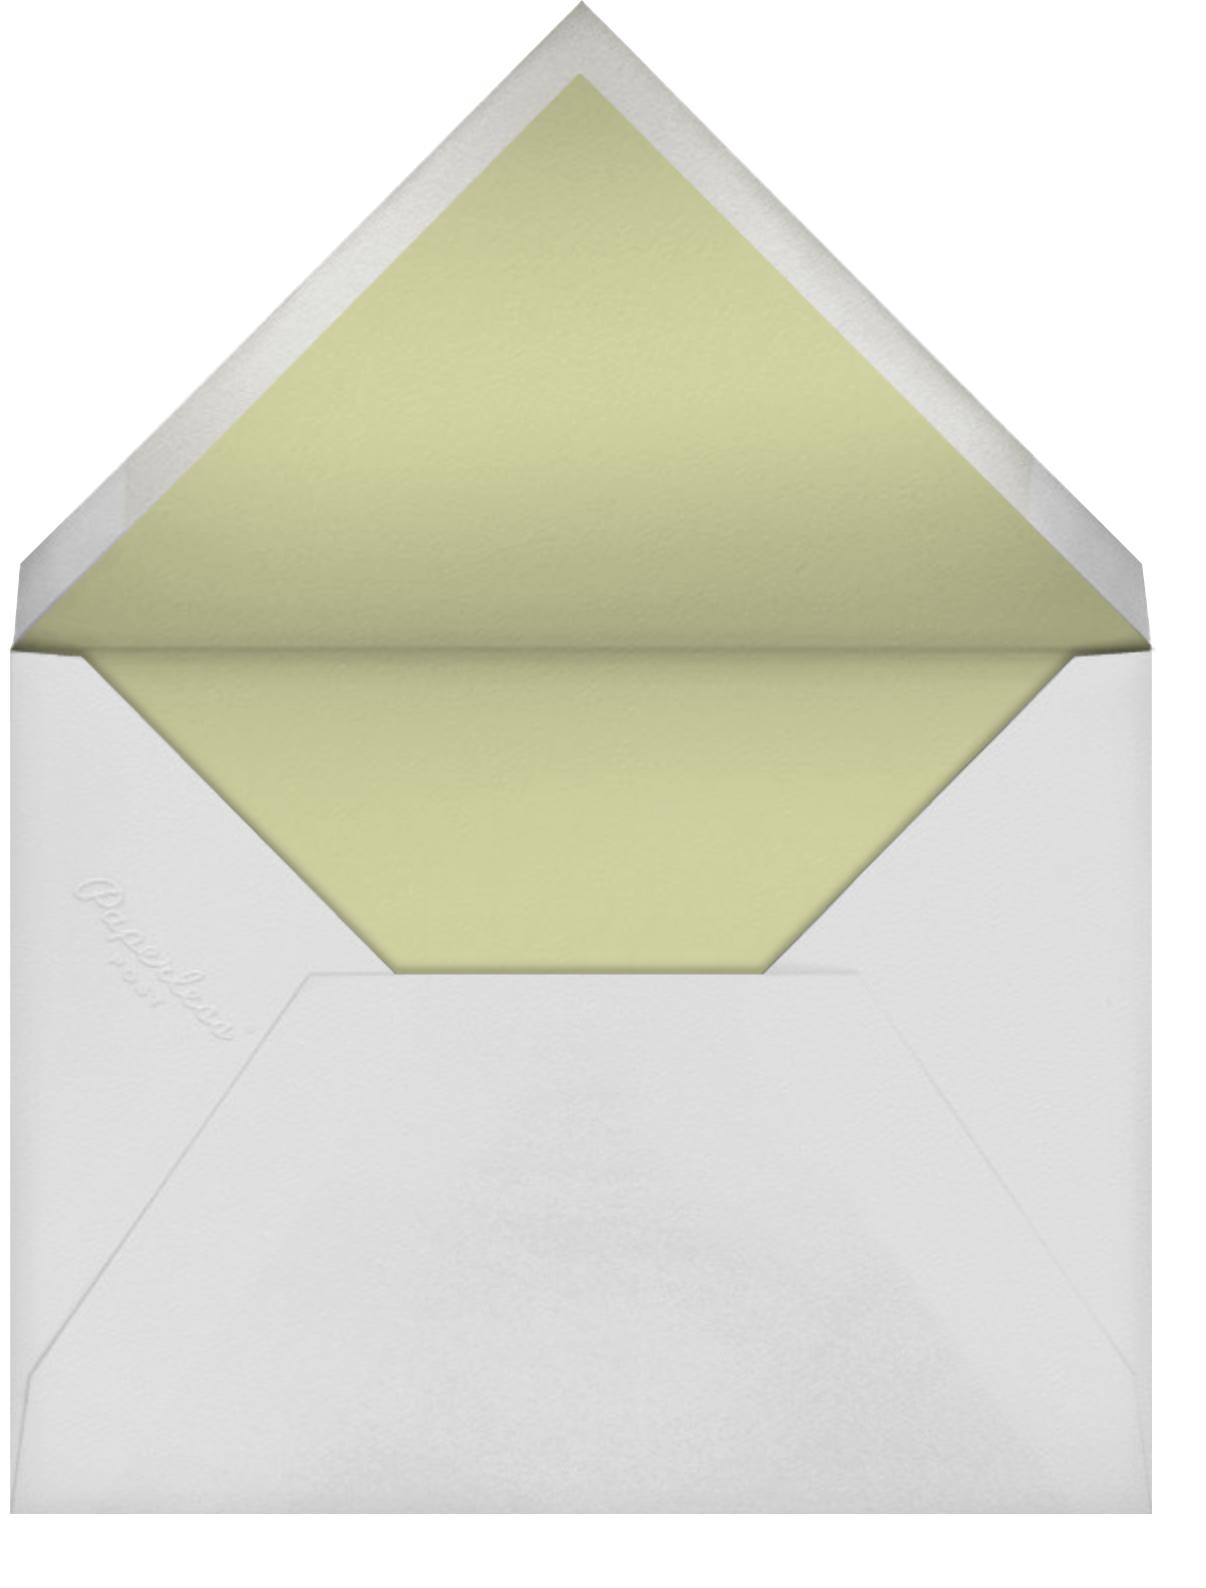 Panarea - Celery - Paperless Post - Envelope